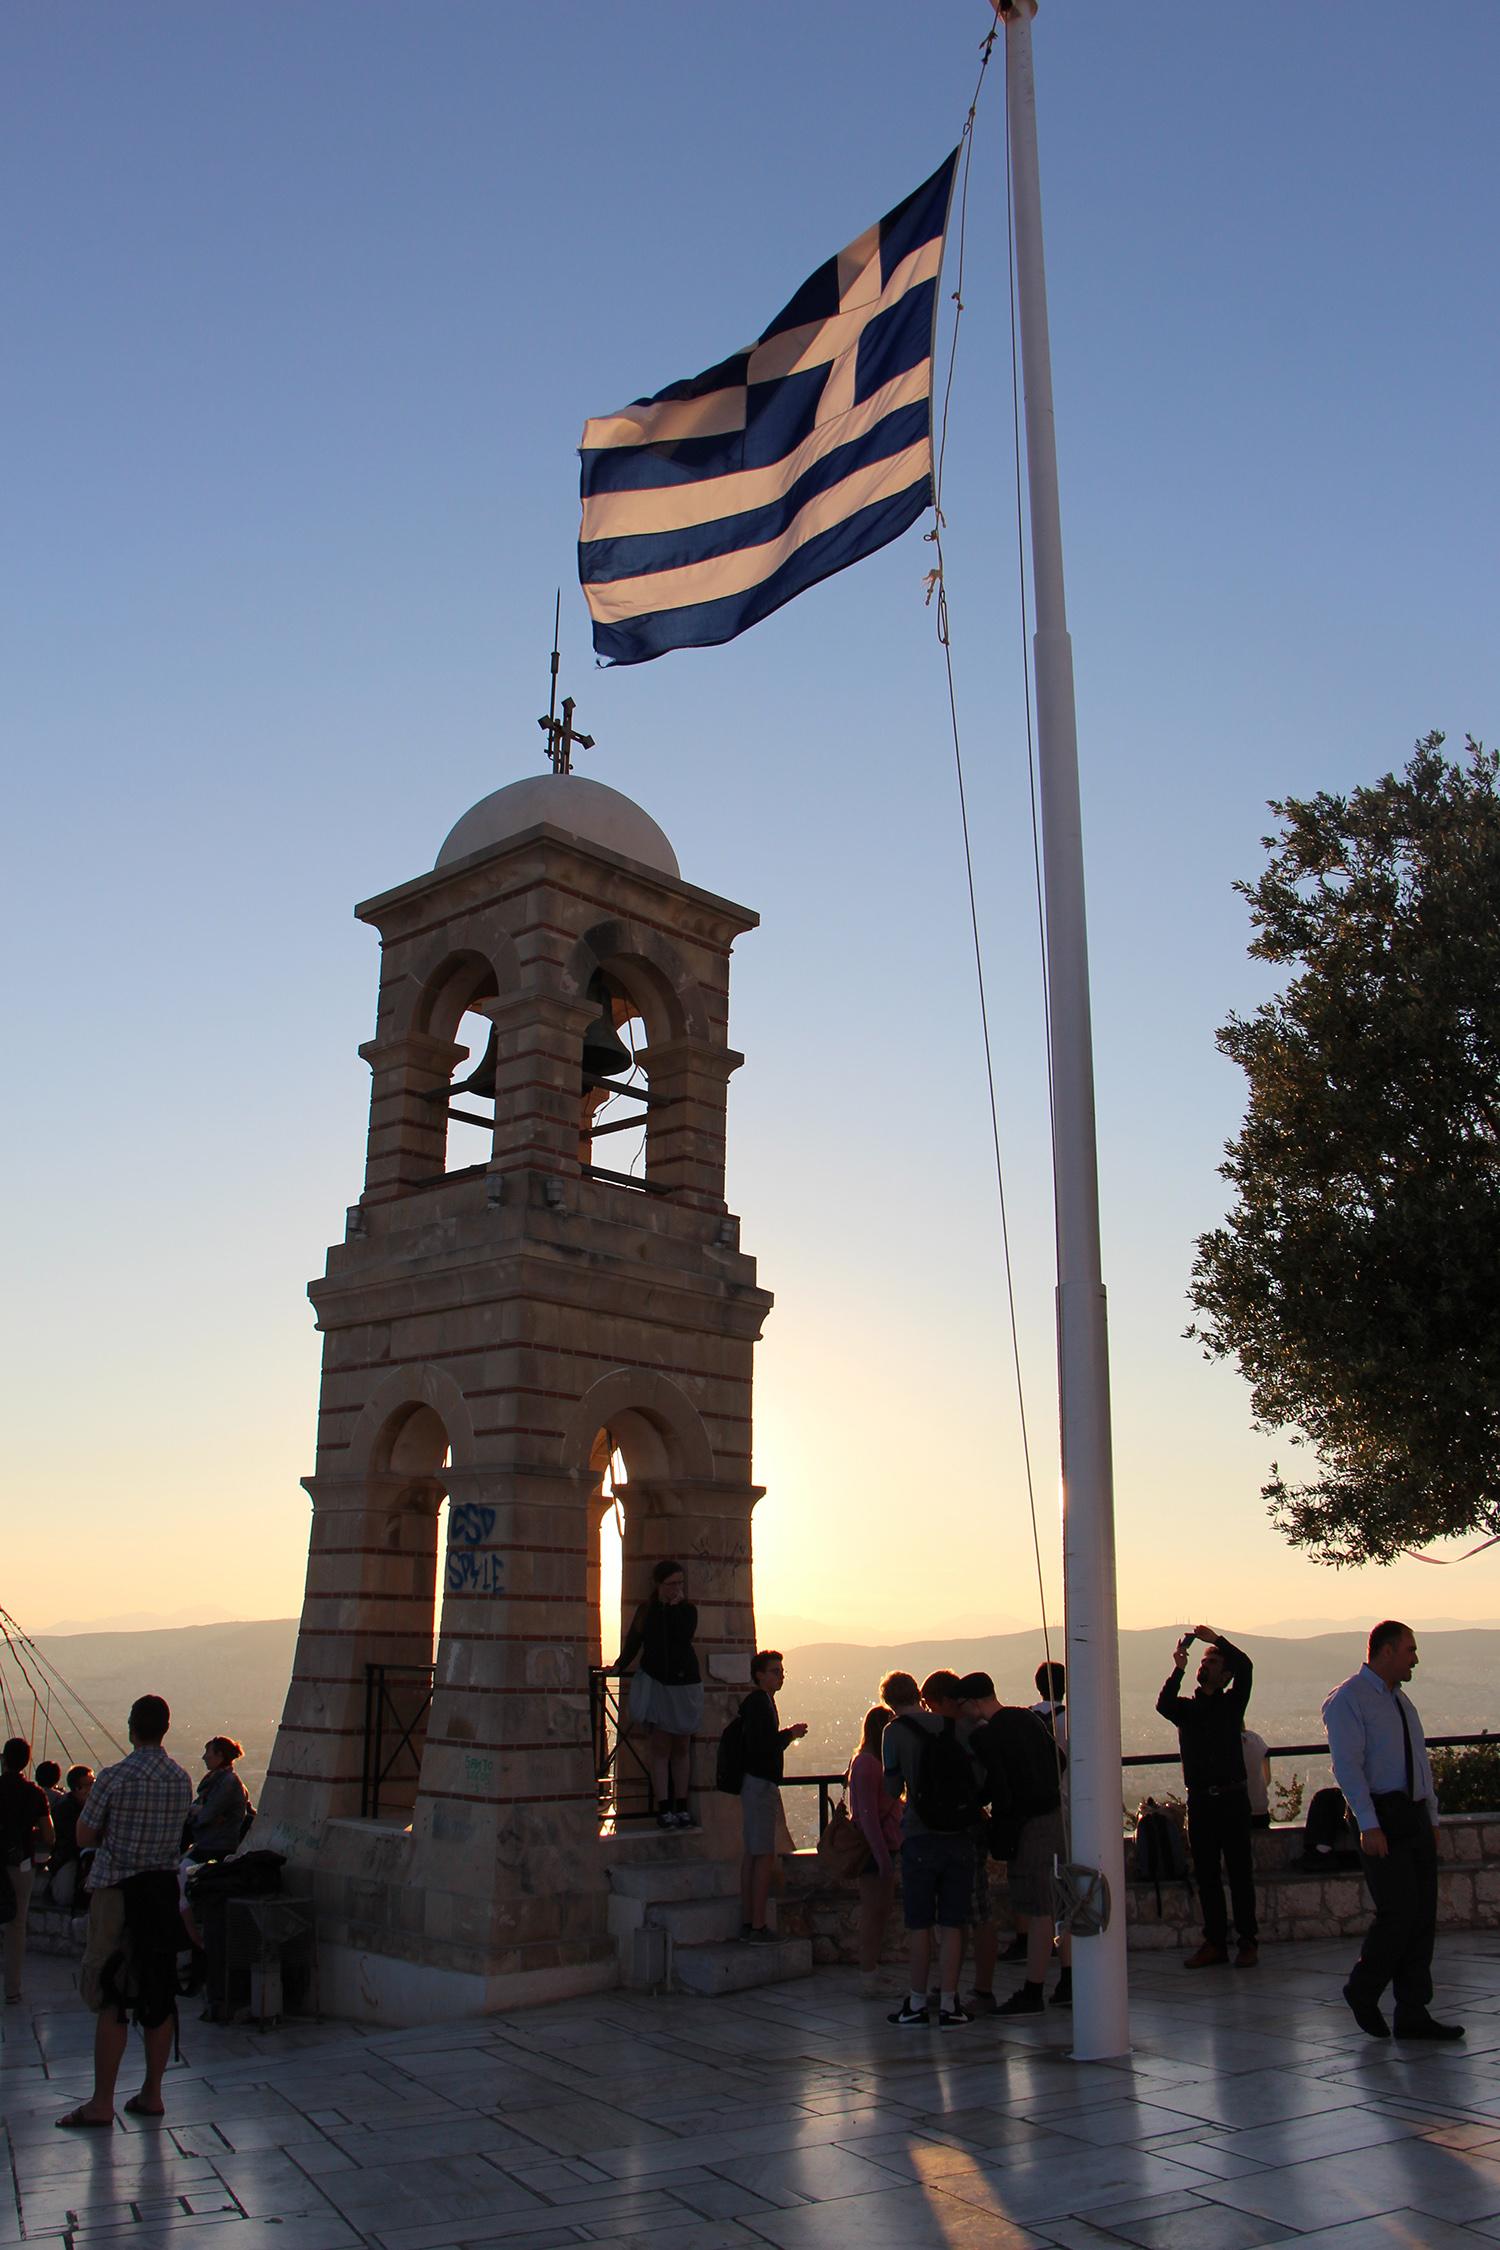 mount lycabettus bell tower